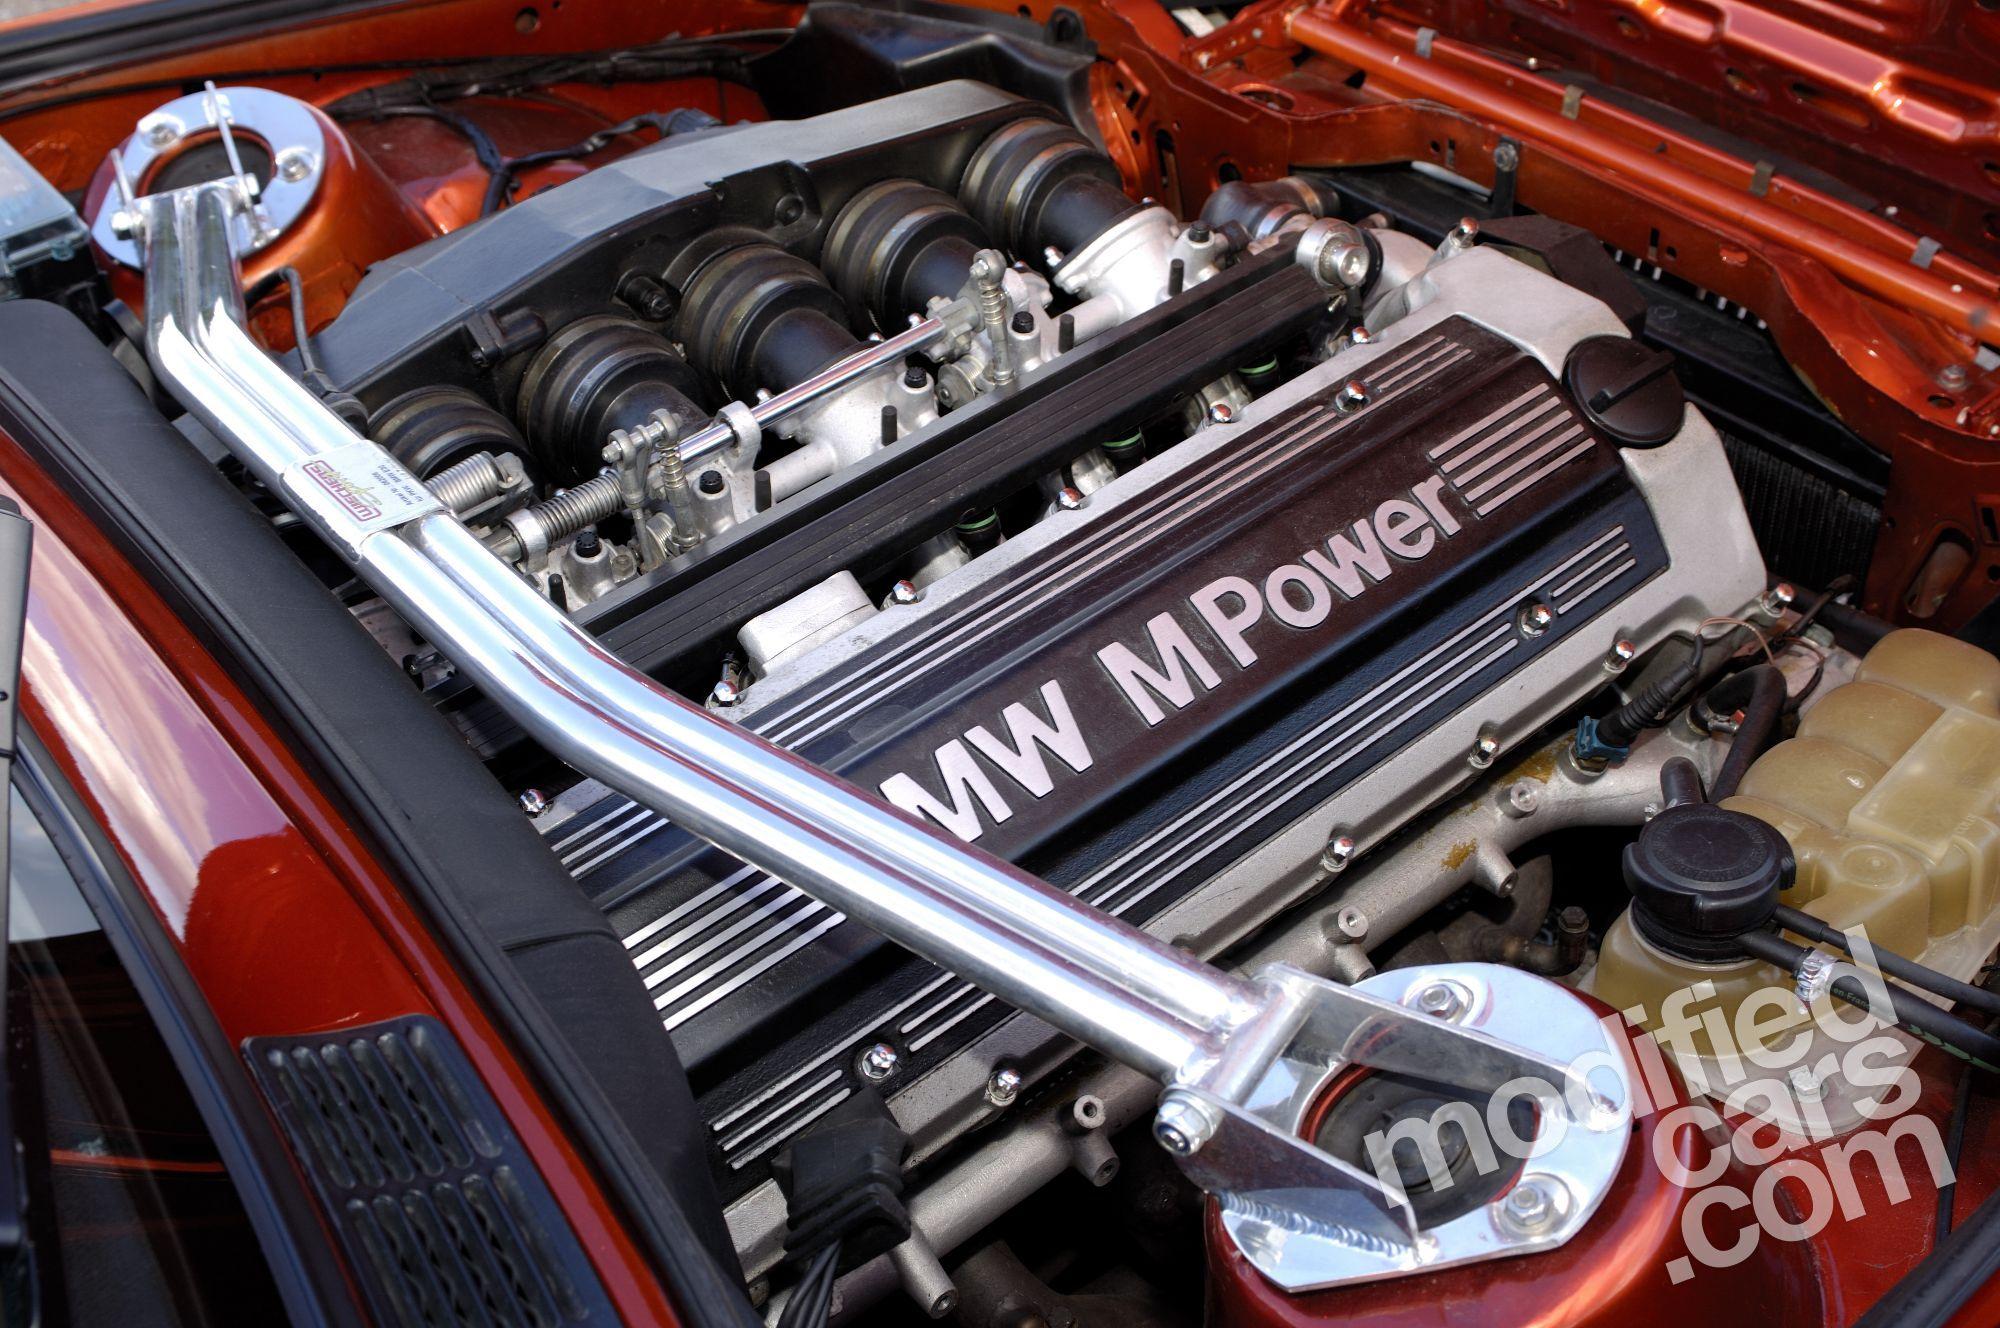 Bmw e30 320i whit s38 engine swap 360 hp cars pinterest bmw bmw e30 320i whit s38 engine swap 360 hp publicscrutiny Choice Image